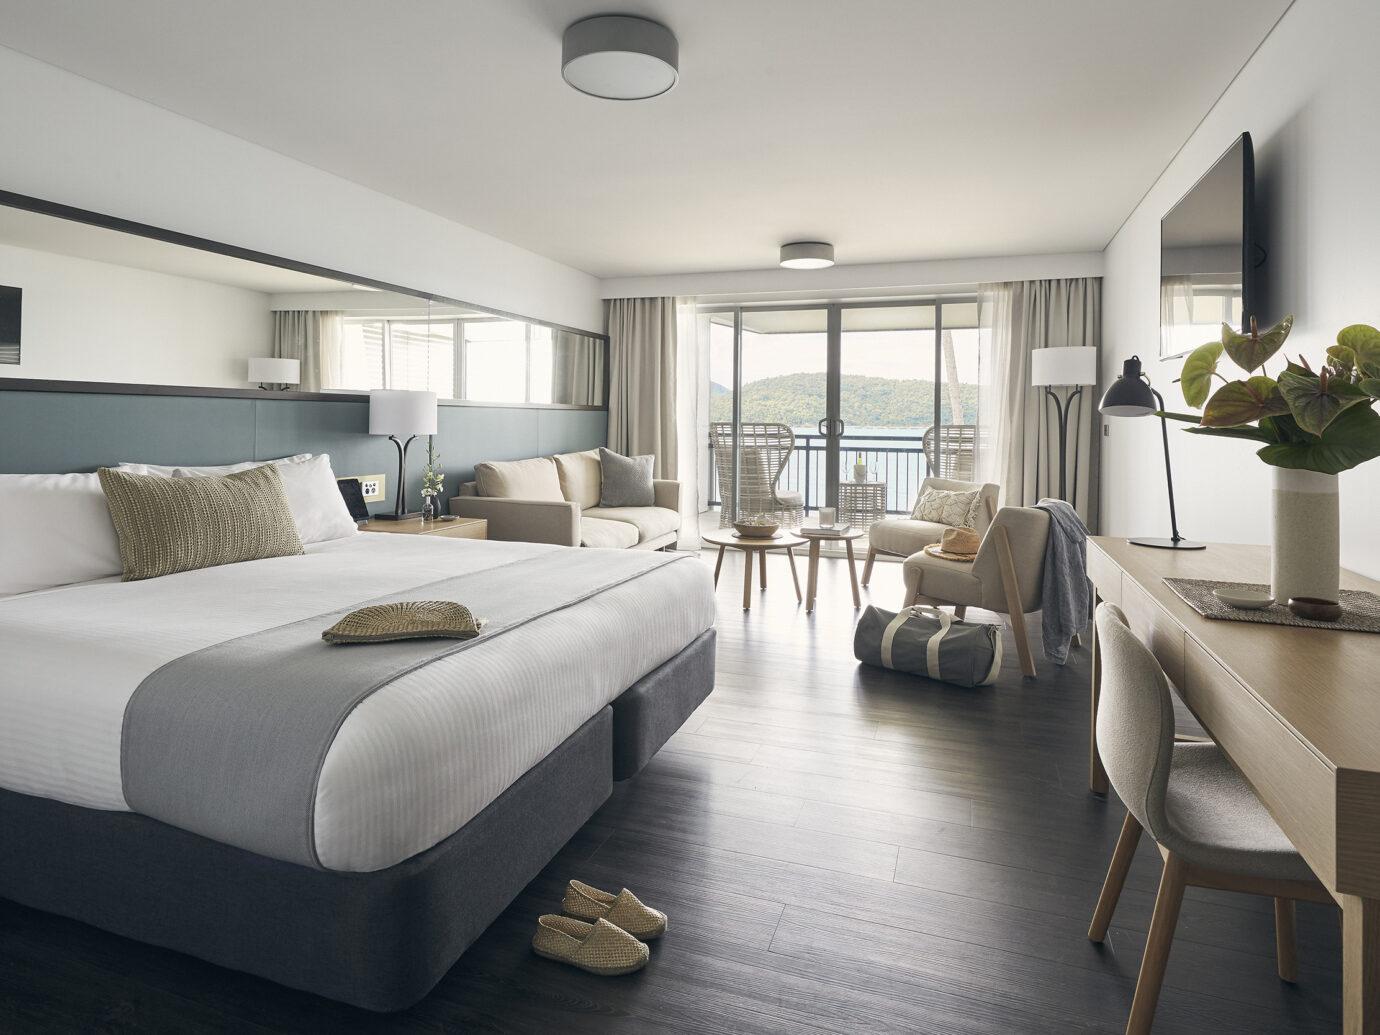 Deluxe Ocean Terrace at Daydream Island